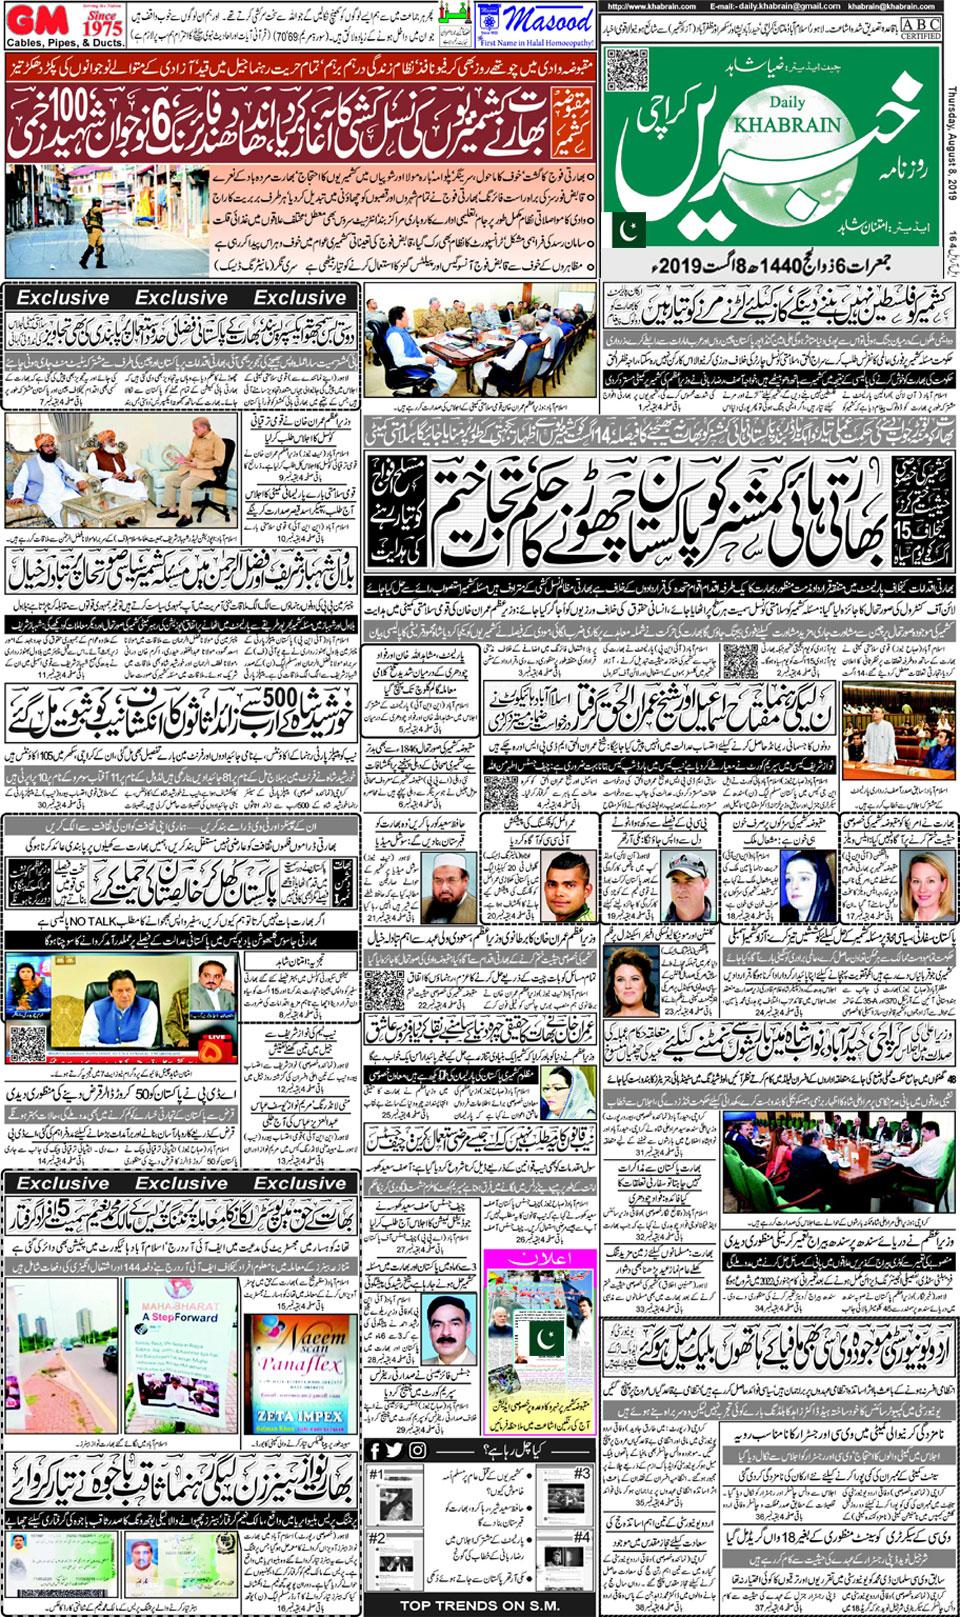 Khabrain Epaper   Daily Khabrain Newspaper   Khabrain E